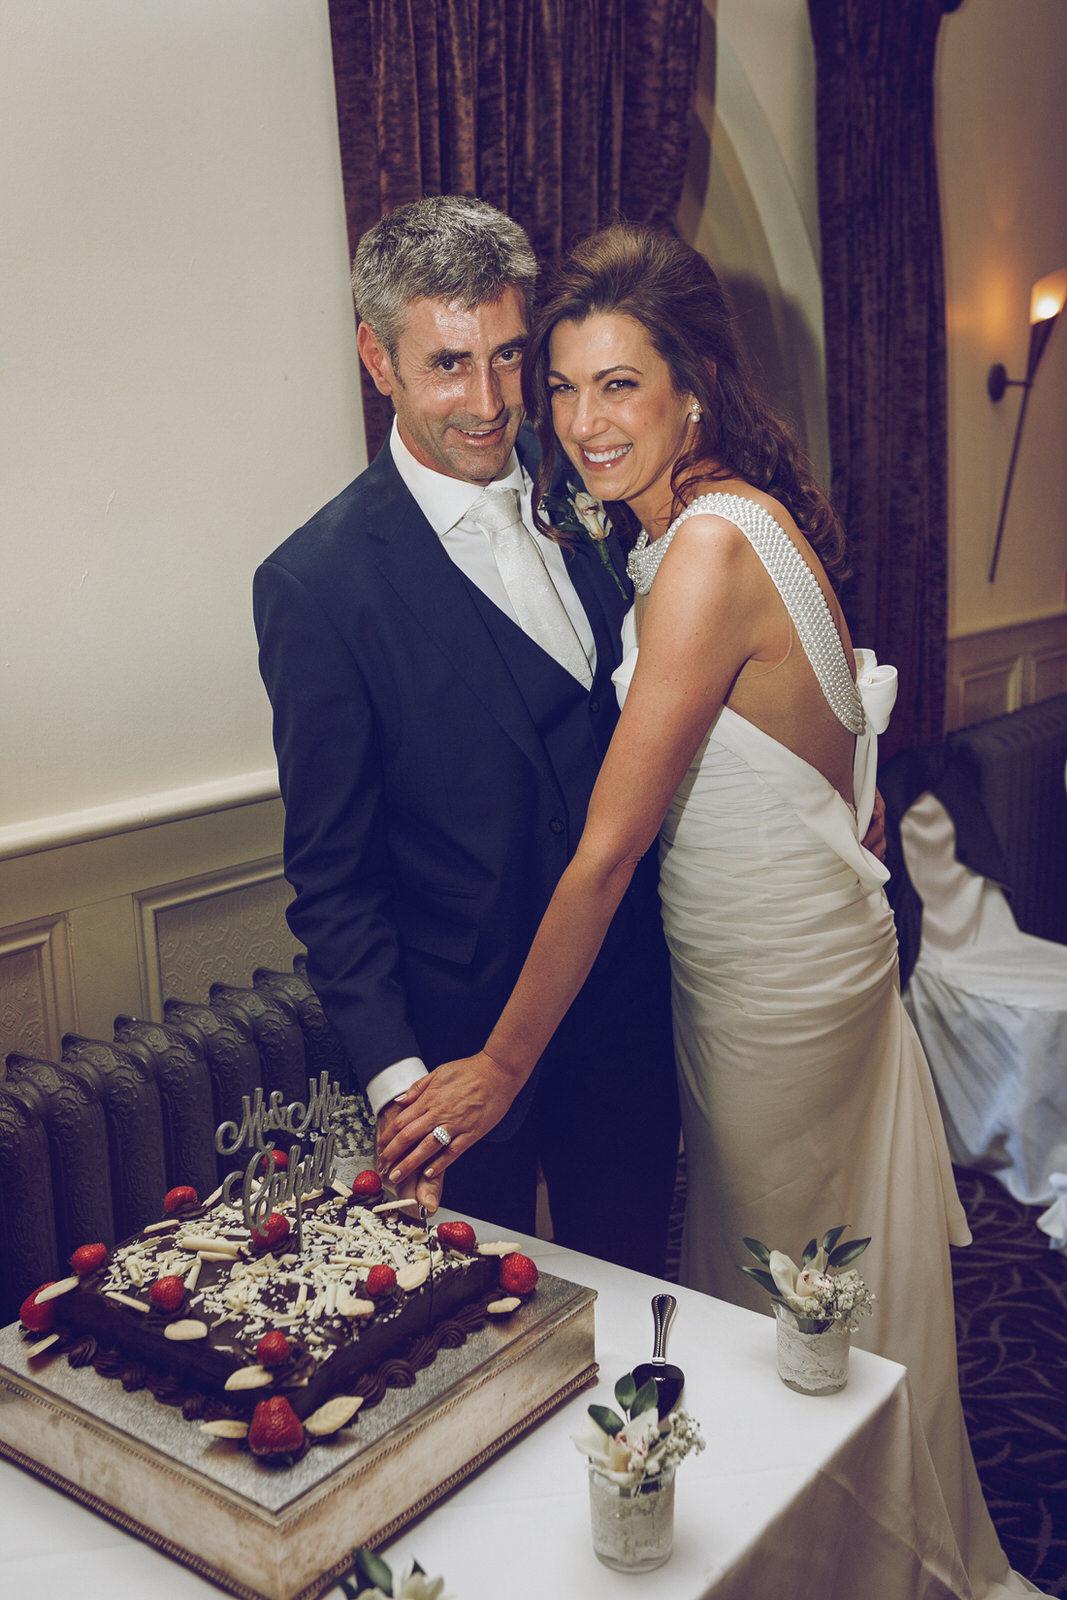 Brooklodge-wicklow-wedding-photographer_136.jpg